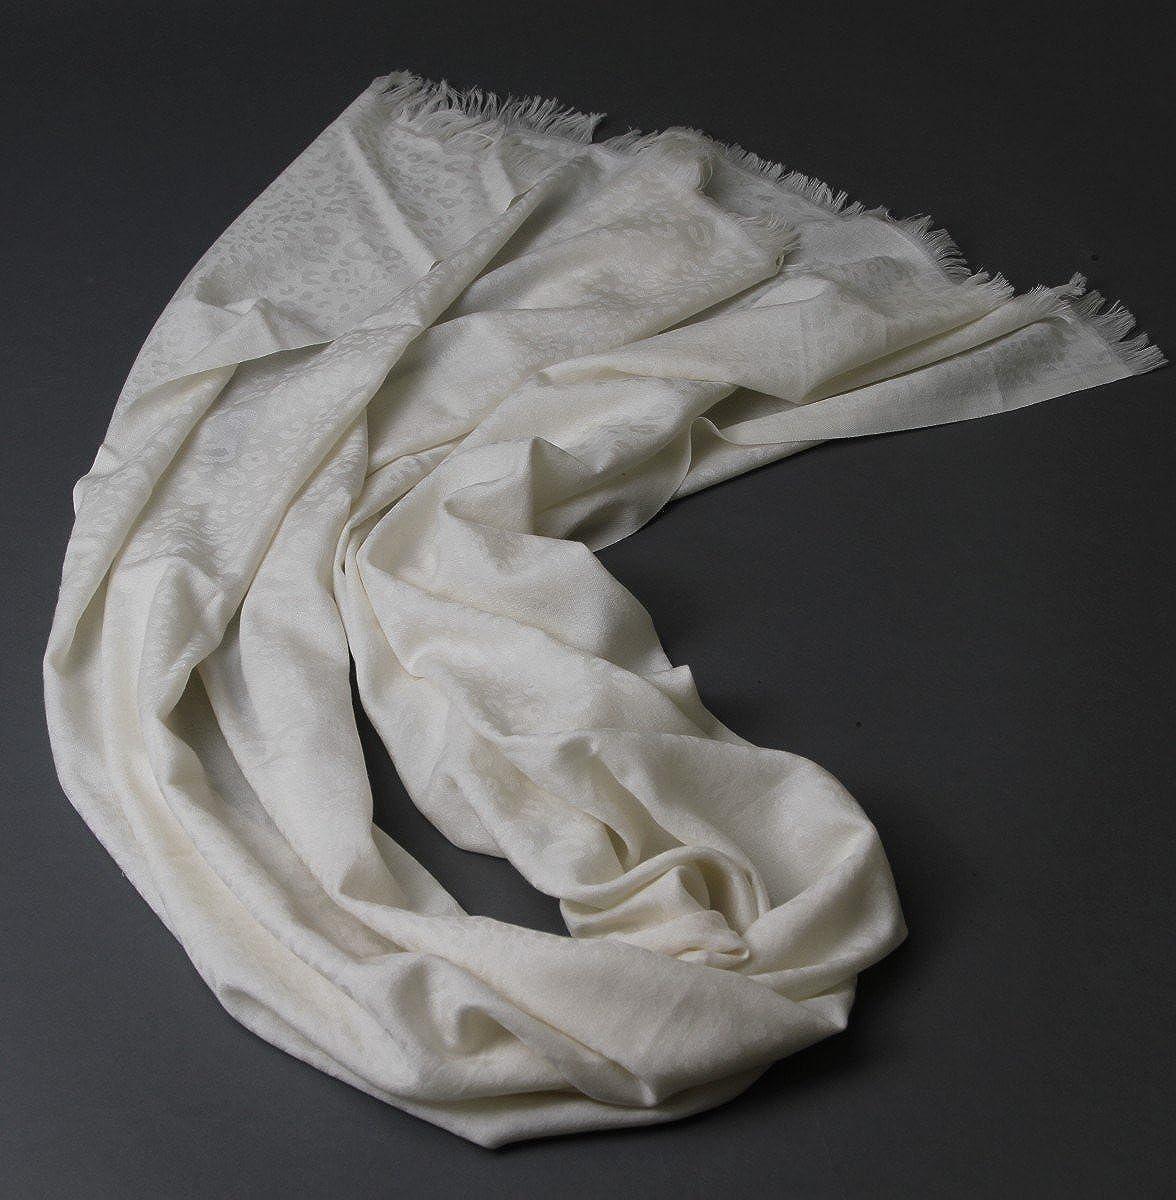 prettystern 200 cm XL Sciarpa Pashmina 100/% Lana Delicato Morbida Stola Donna Tigrata Discreta